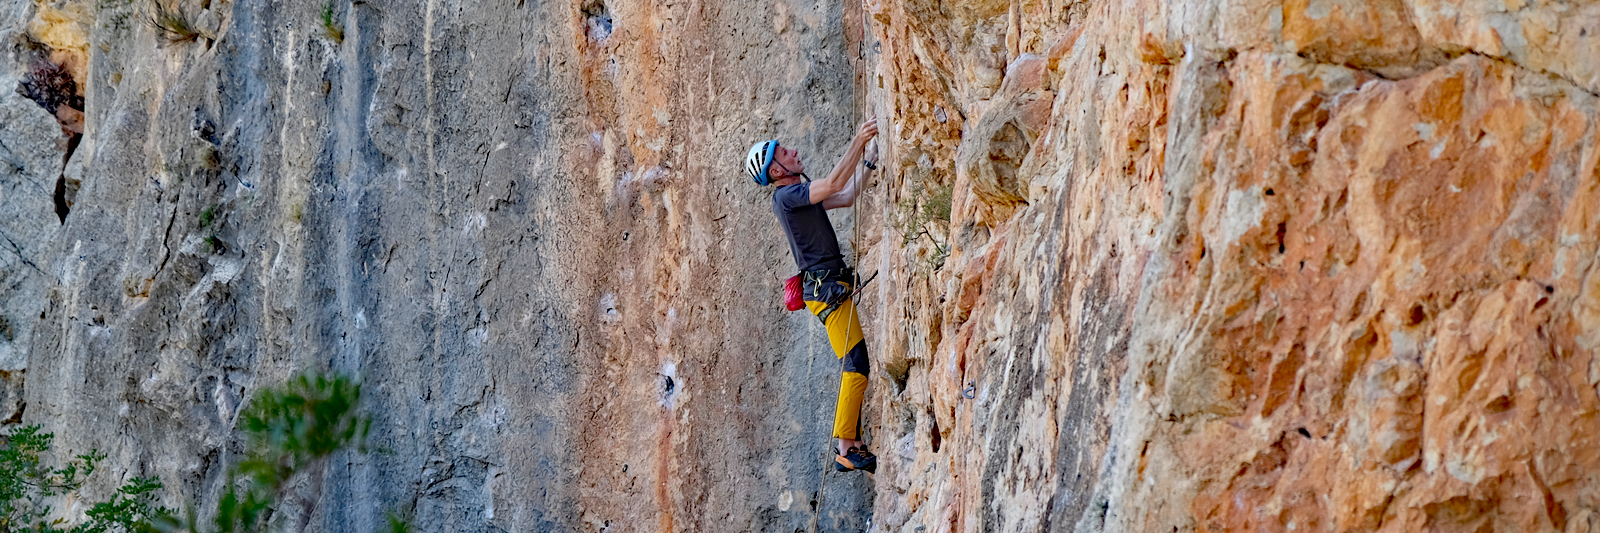 Rock-climbing-holiday-coaching-course-Costa-Blanca